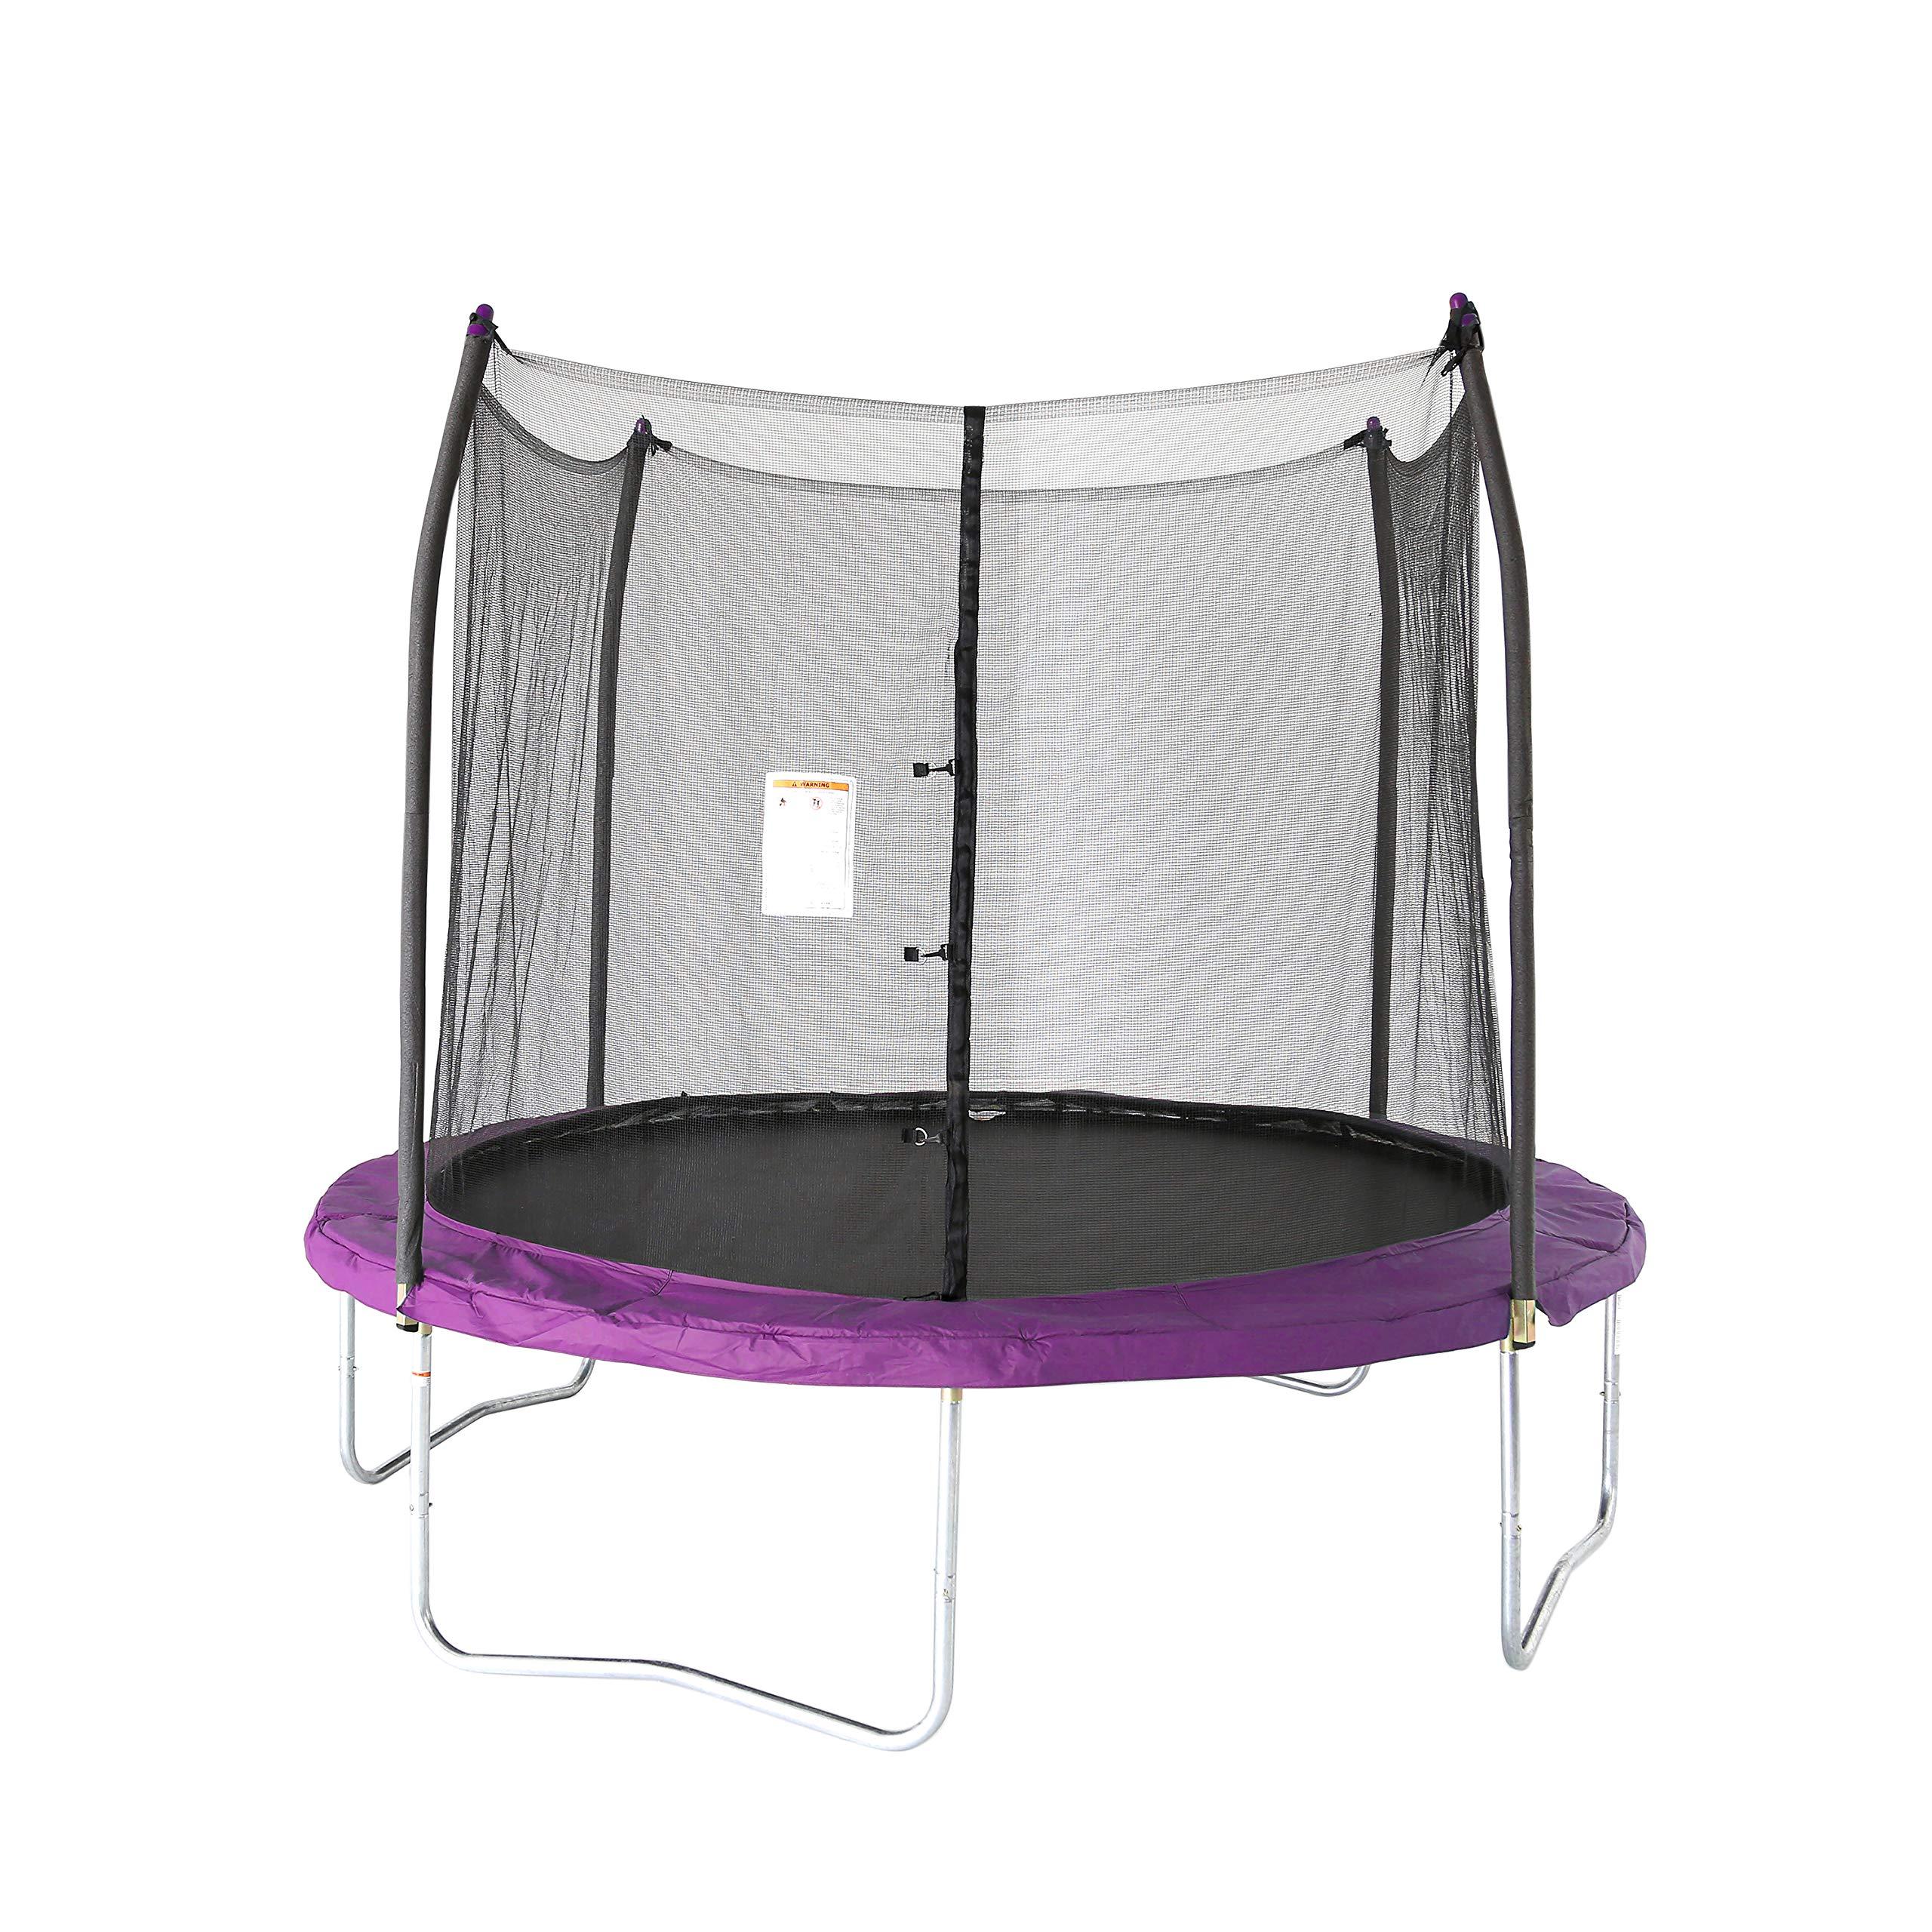 Skywalker Trampolines 10 -Foot Round Trampoline and Enclosure with spring, Purple by Skywalker Trampolines